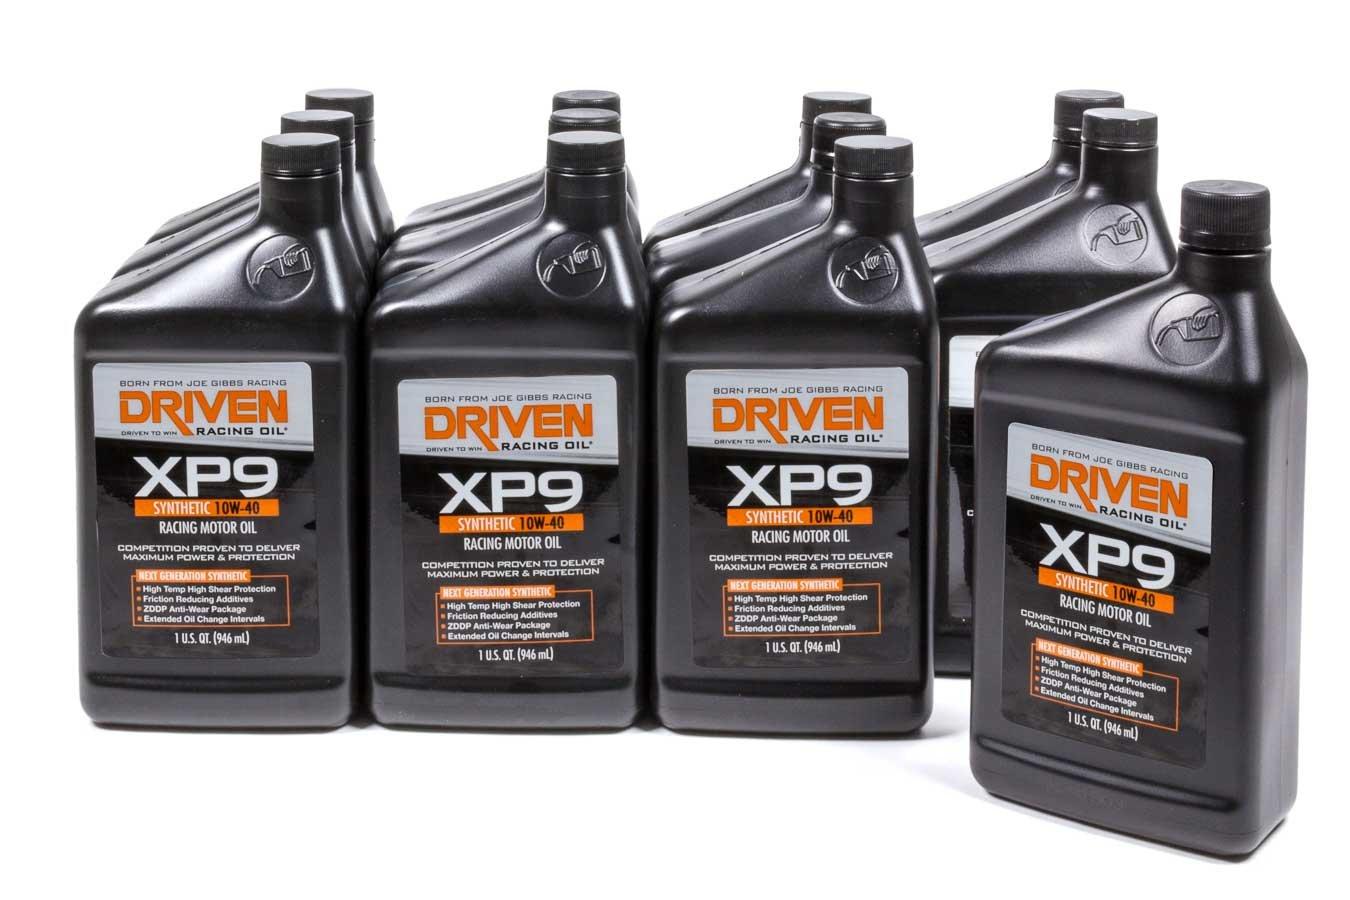 Driven Racing Oil xp9 10 W40 1モーターオイルQT 12ケースP / N 03207 B01MA3OTLB